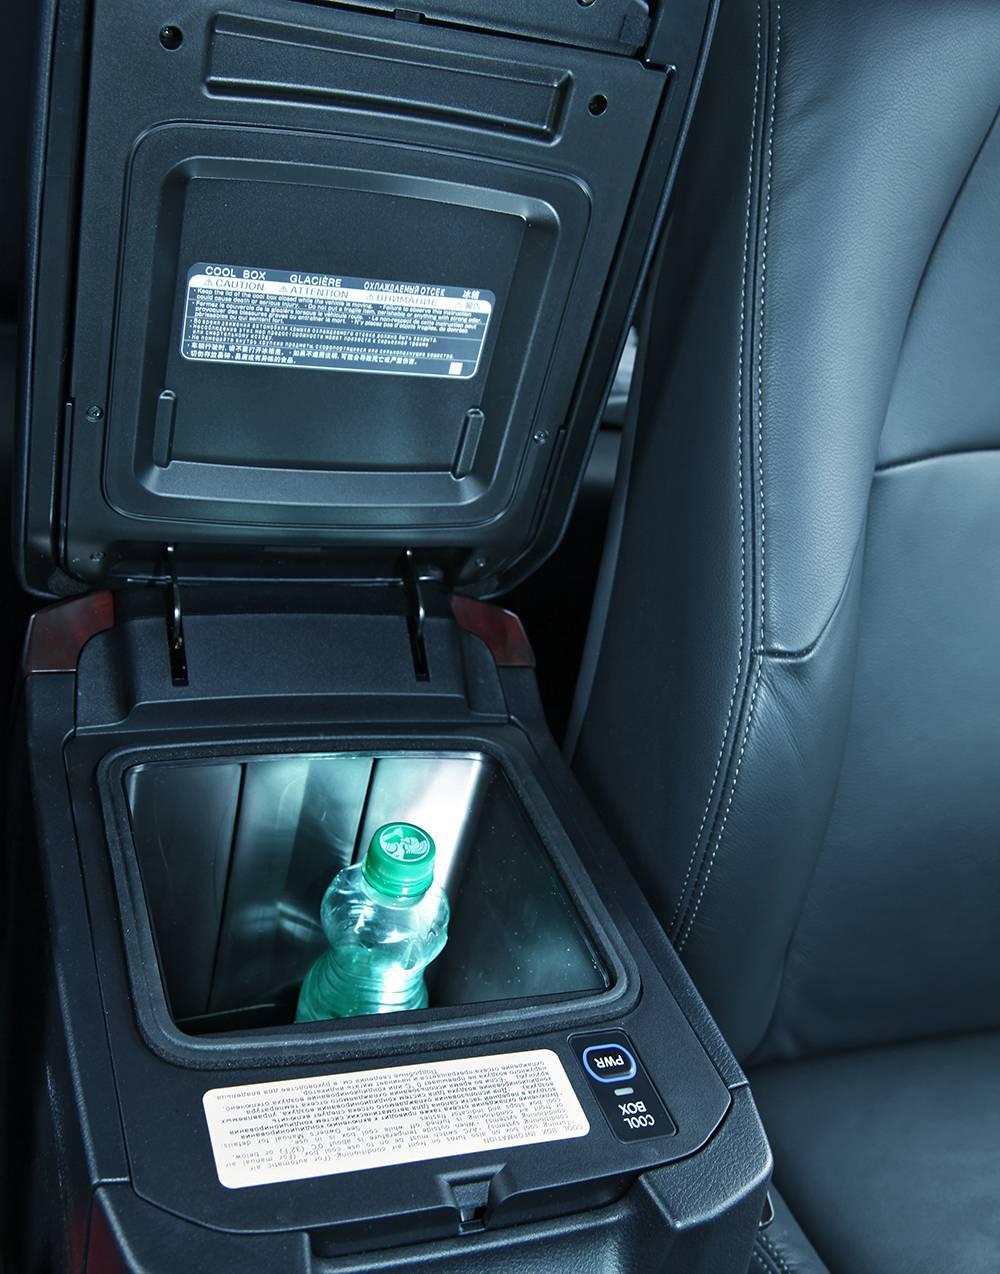 Toyota Landcruiser 3,0 D-4D Elegance 2014 kühlschrank kühlbox